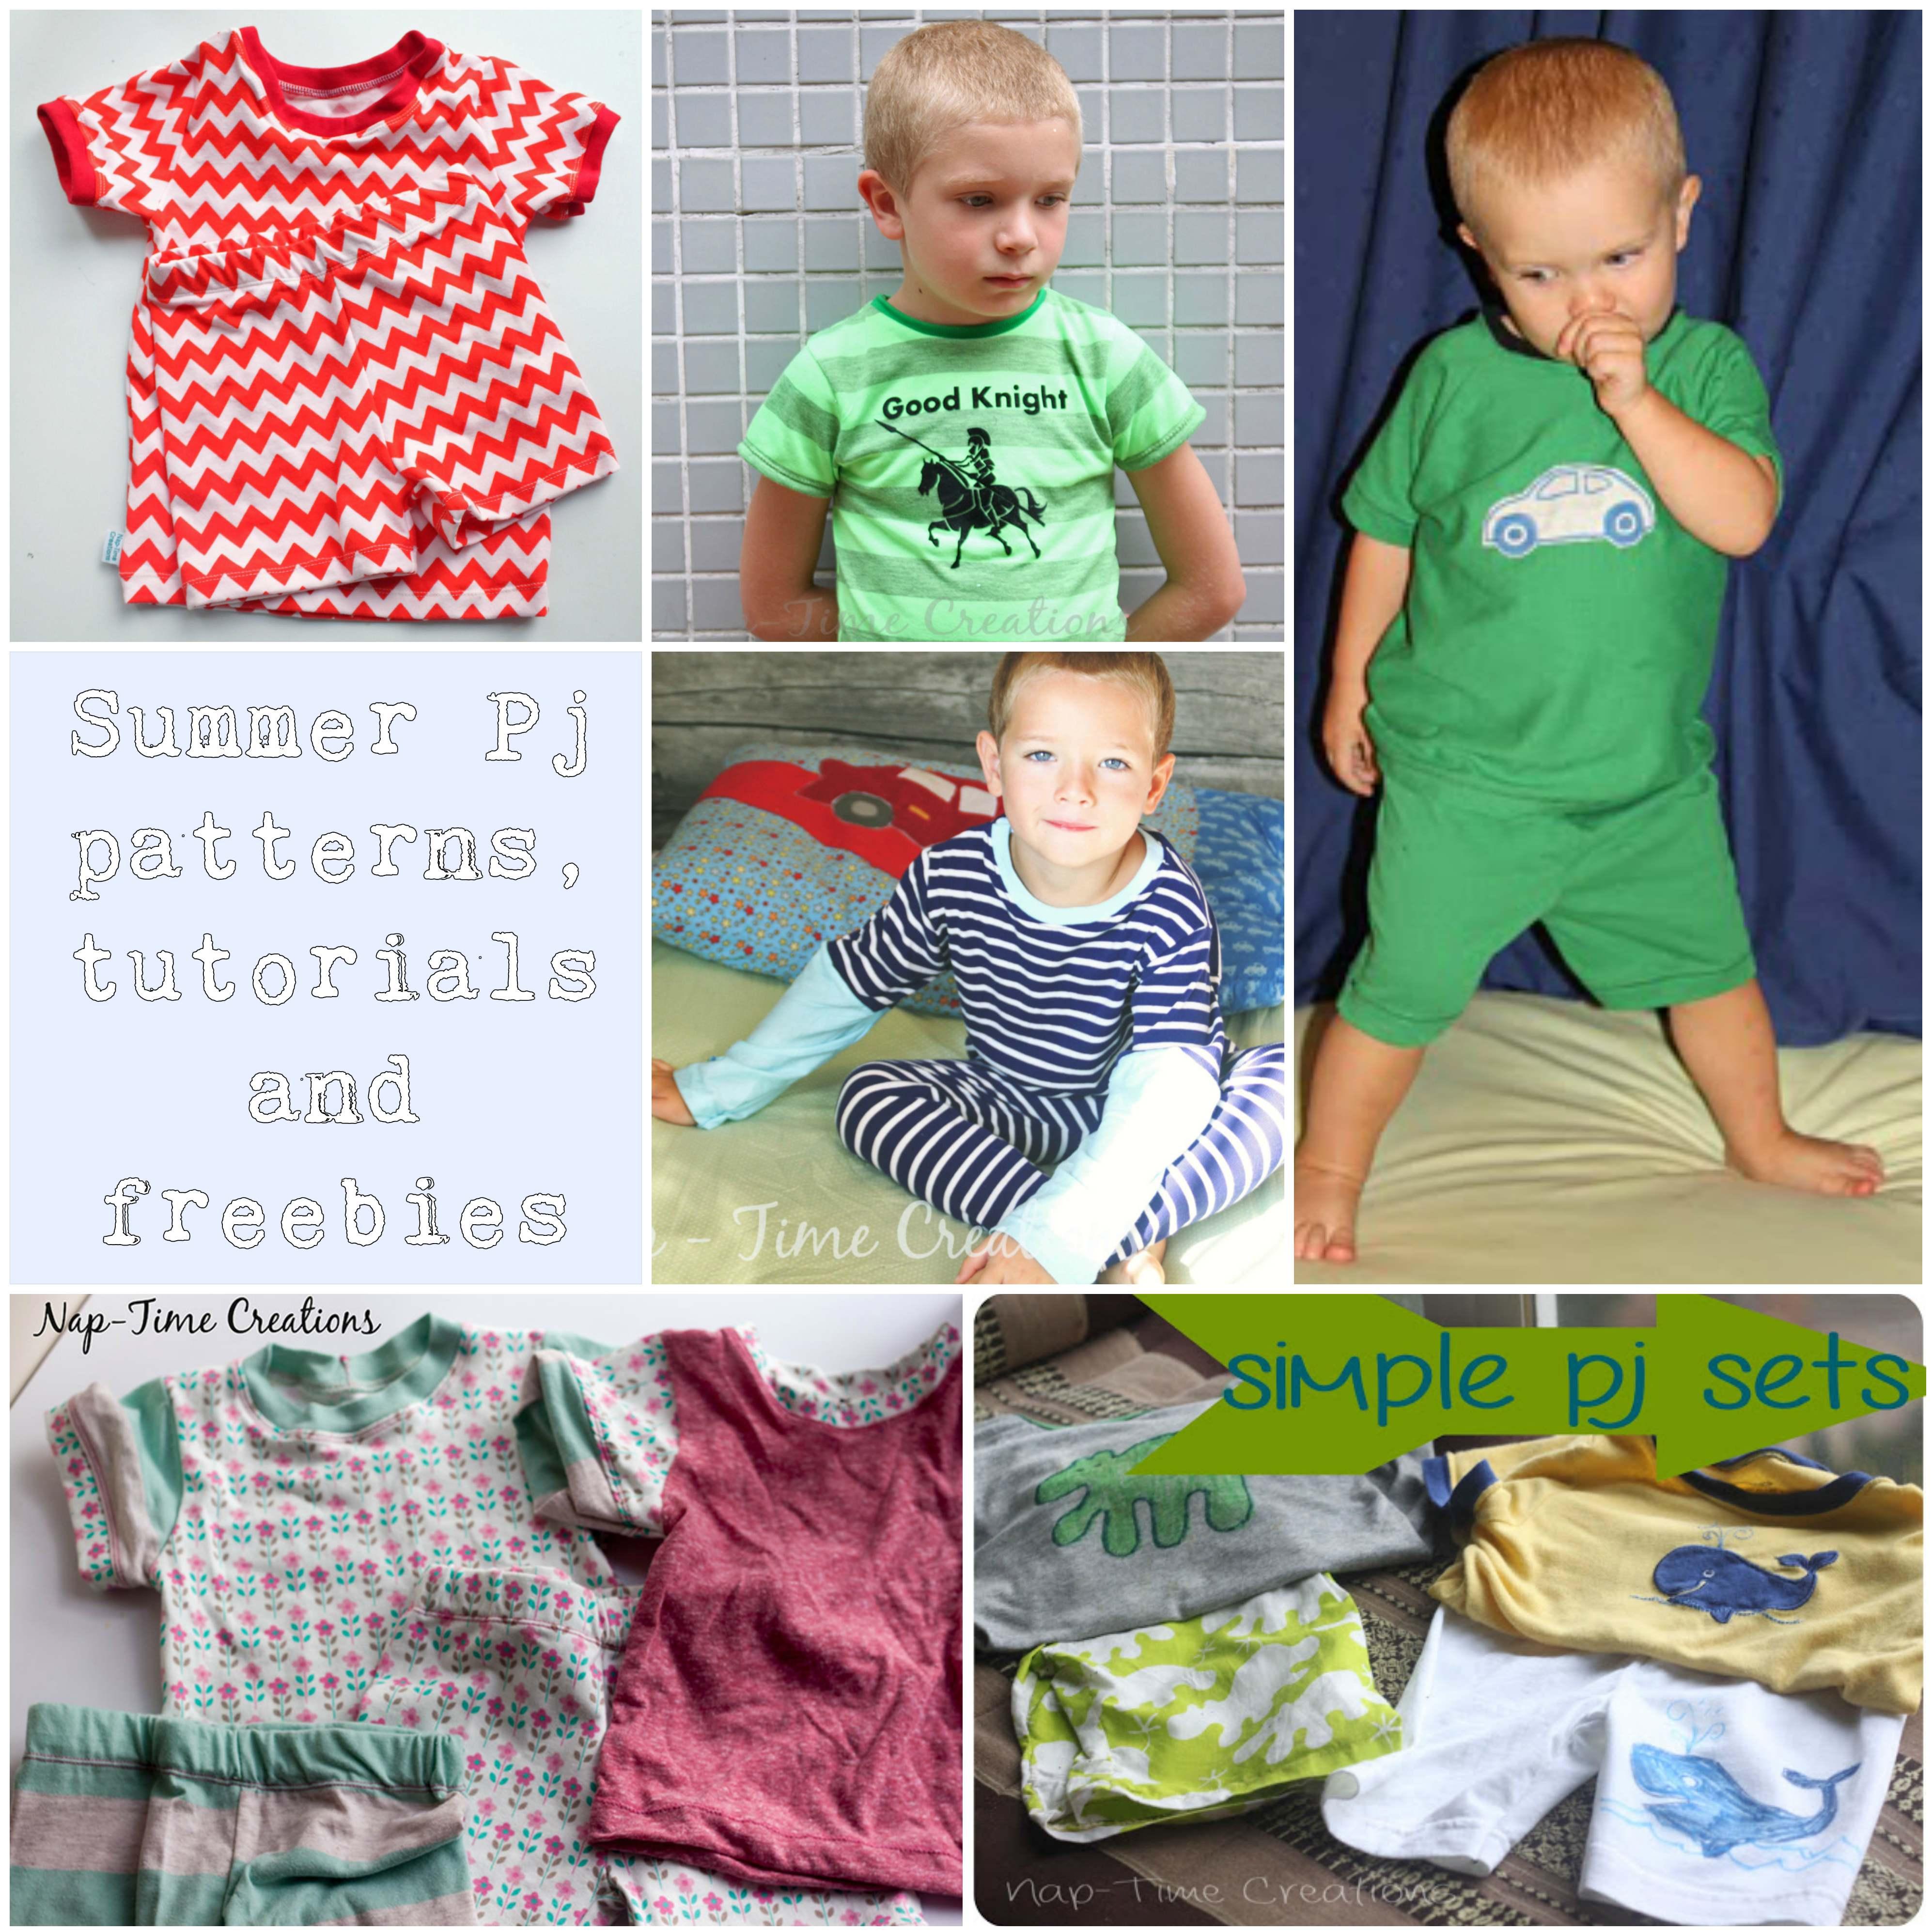 summer pj patterns tutorials and freebies for kids